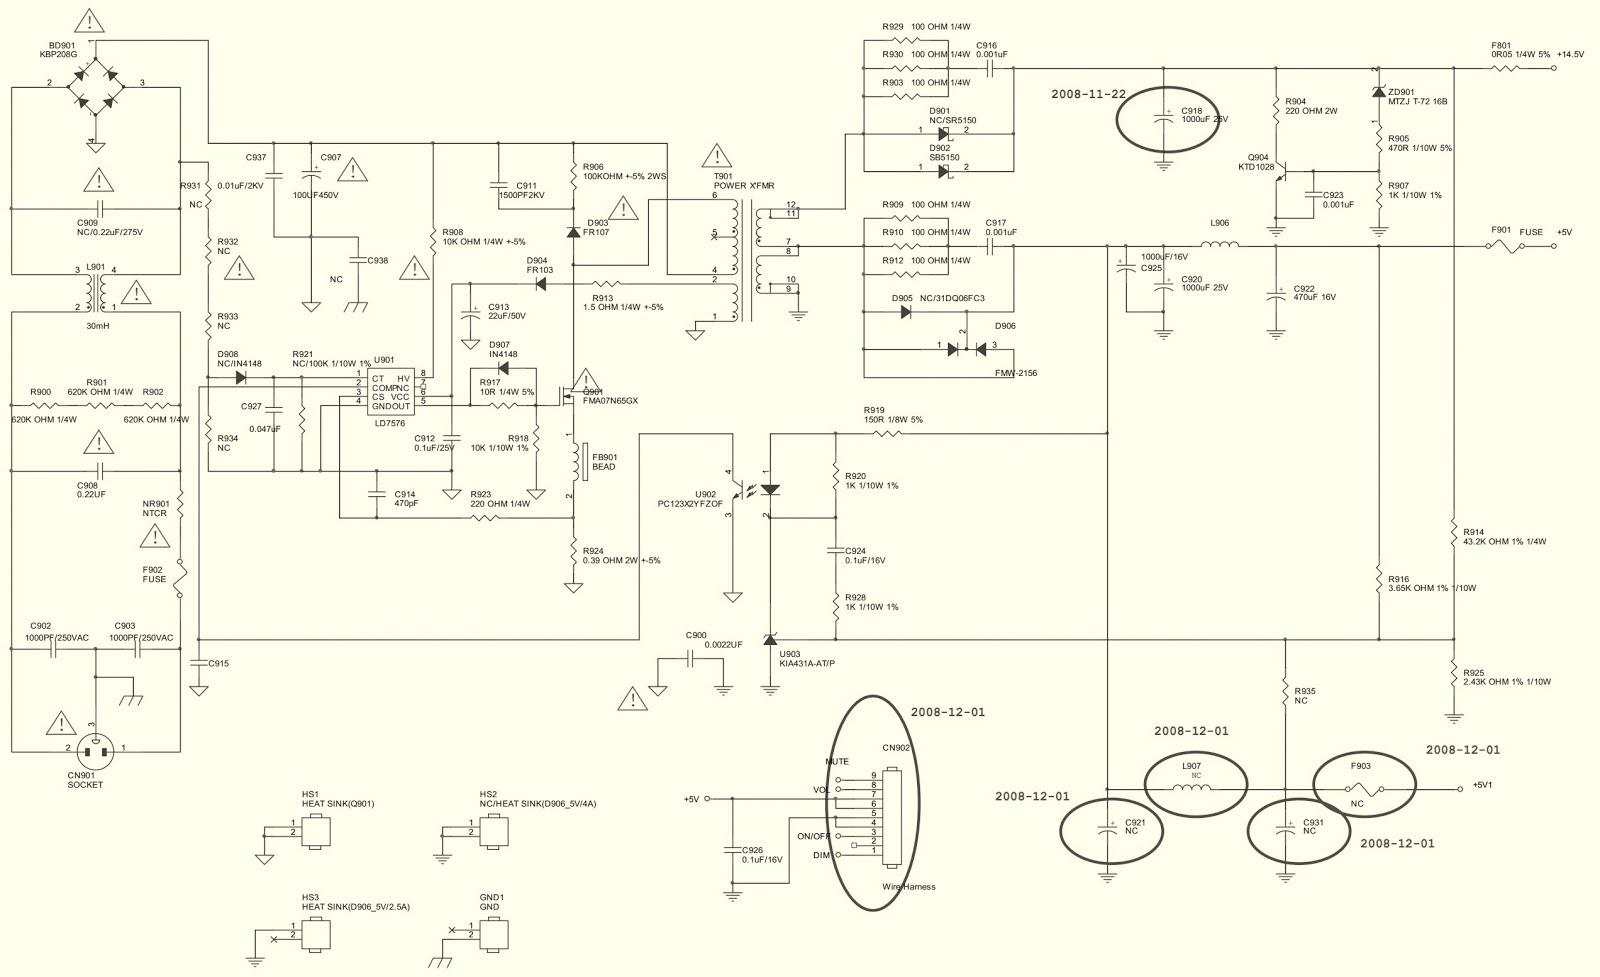 medium resolution of aoc2236vwa lcd monitor circuit diagram 7155g2892 power board dell lcd monitor schematic diagram lcd monitor schematic diagram